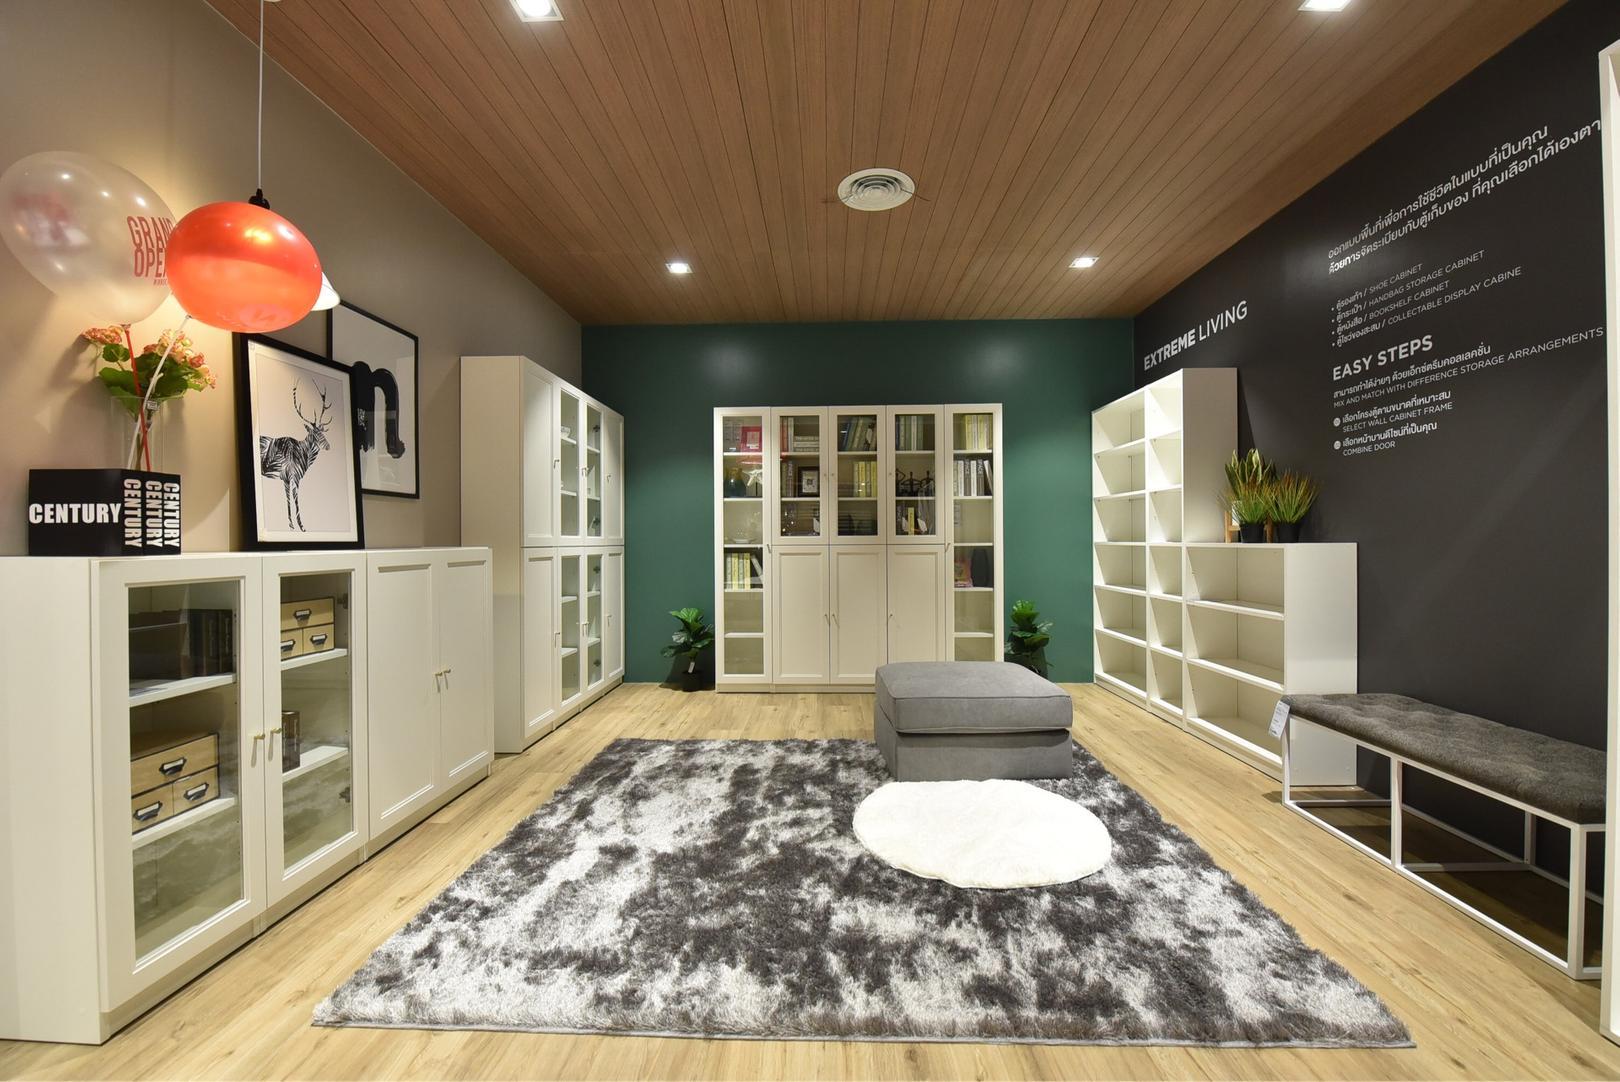 Winner Furniture Center